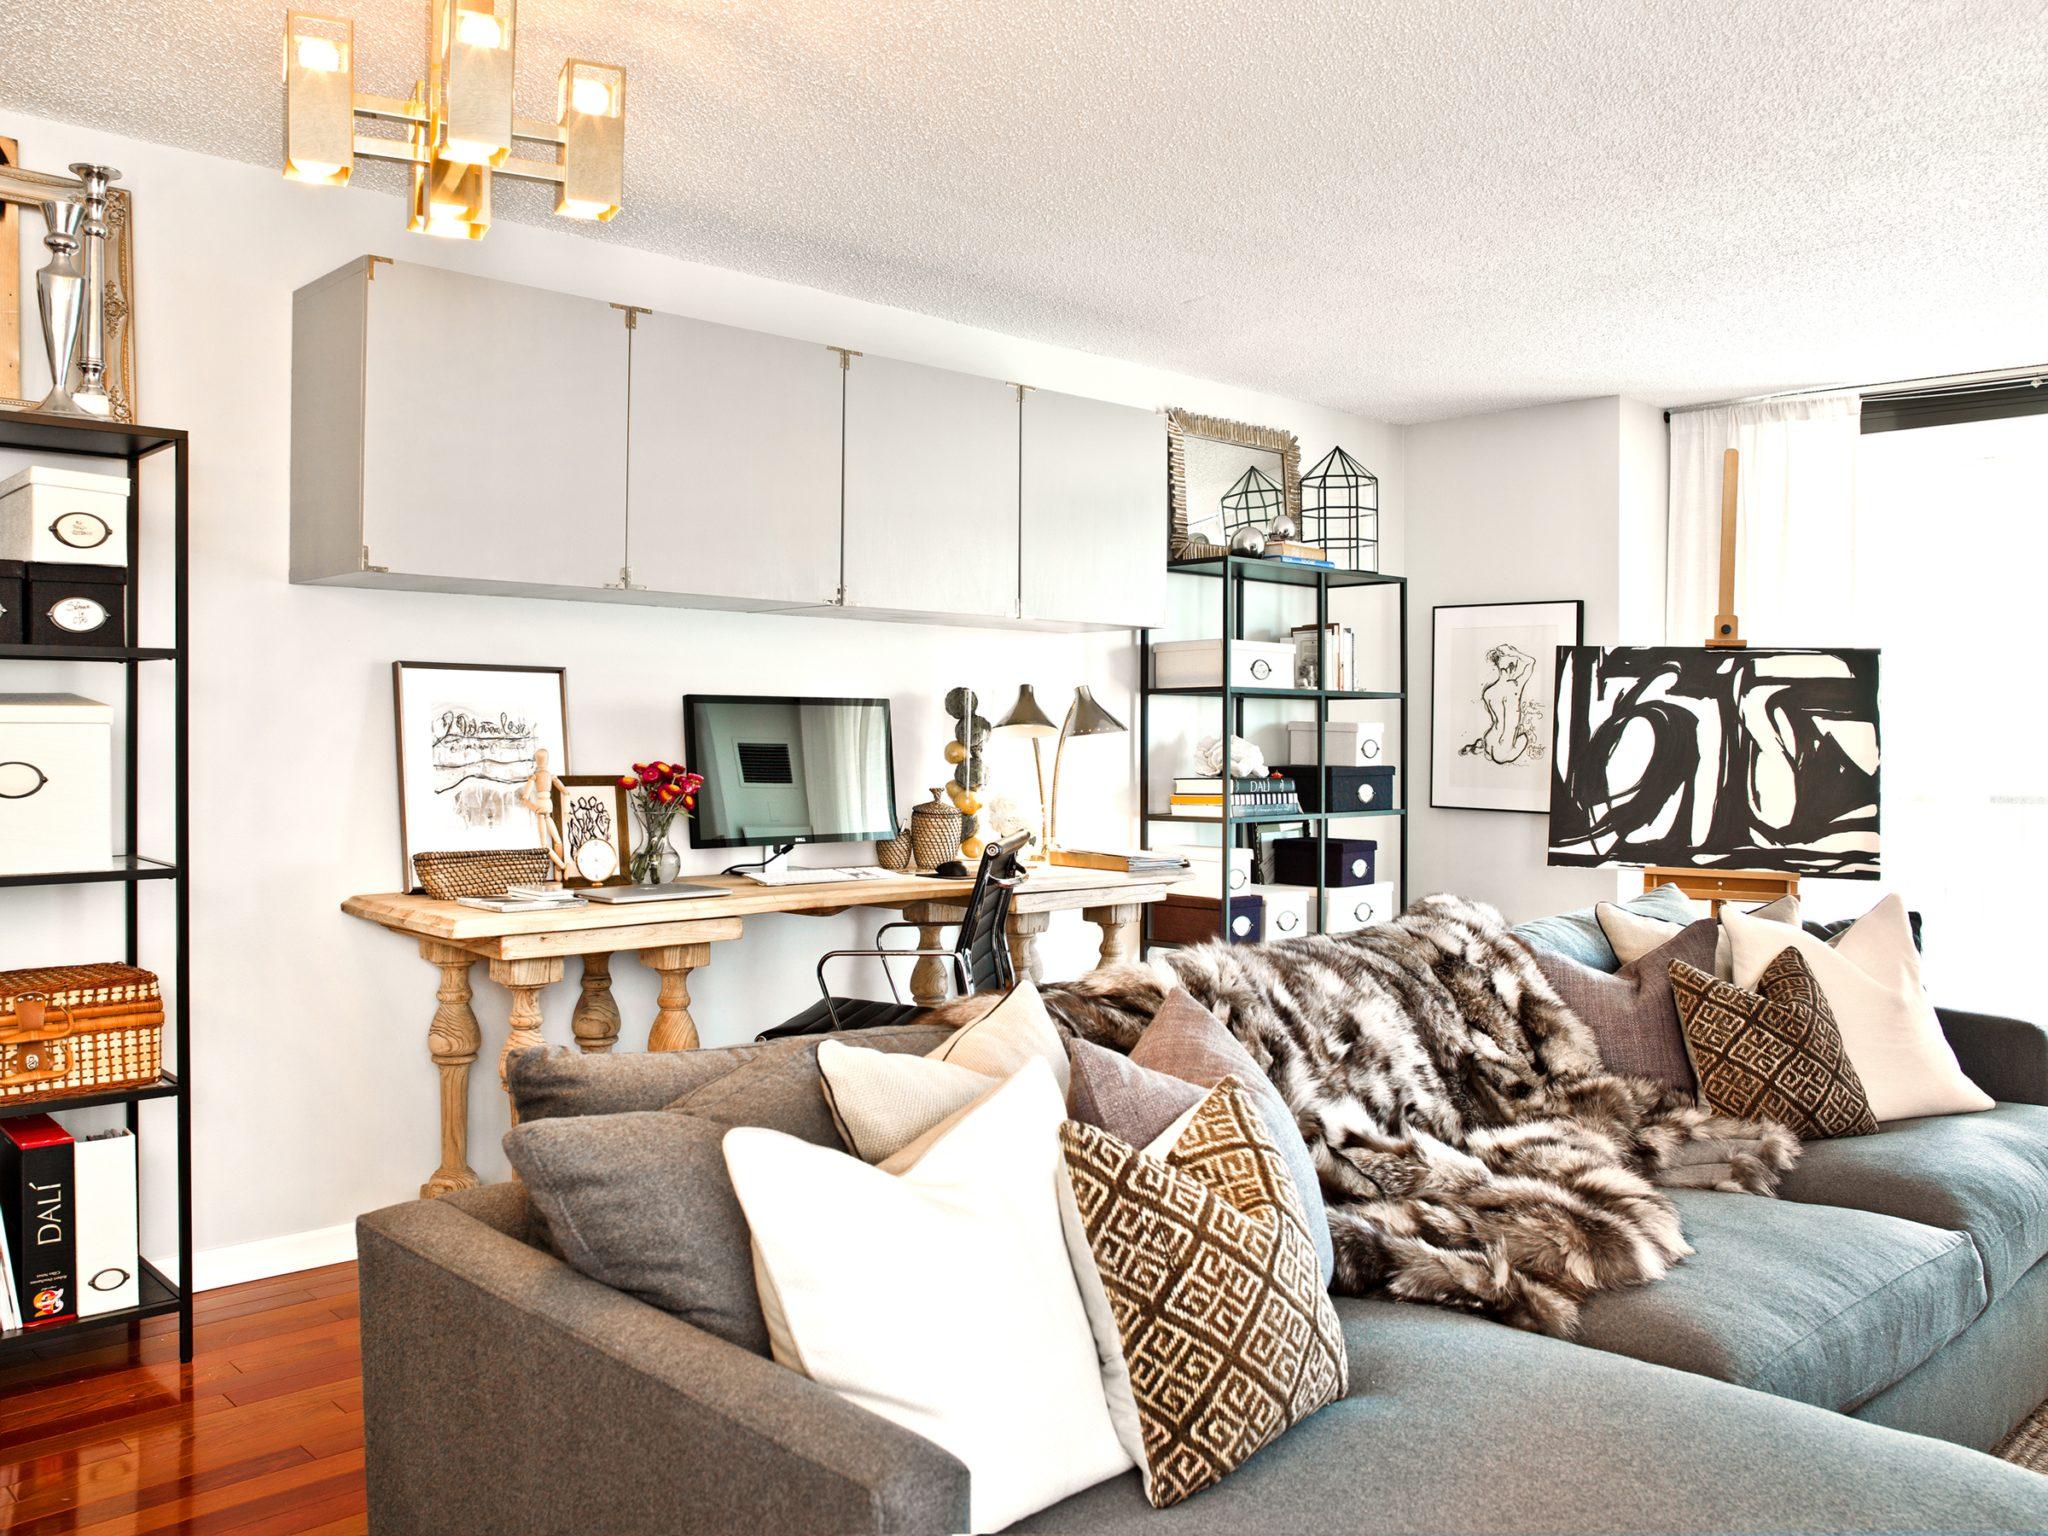 Interior design by Brynn Olson Design Group